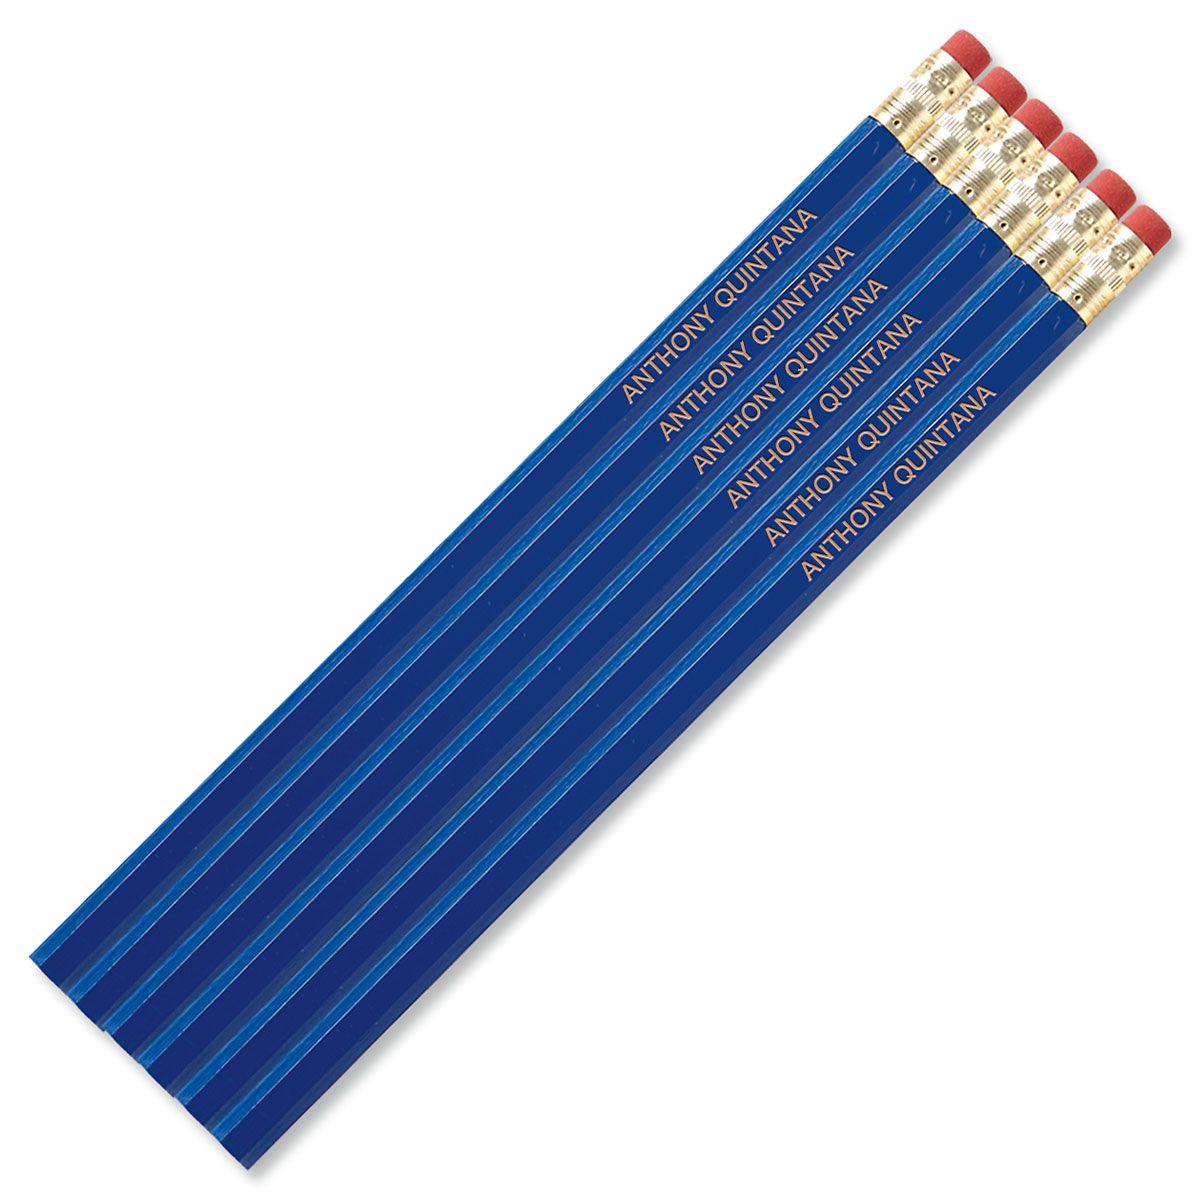 #2 Personalized Hardwood Pencils - Blue